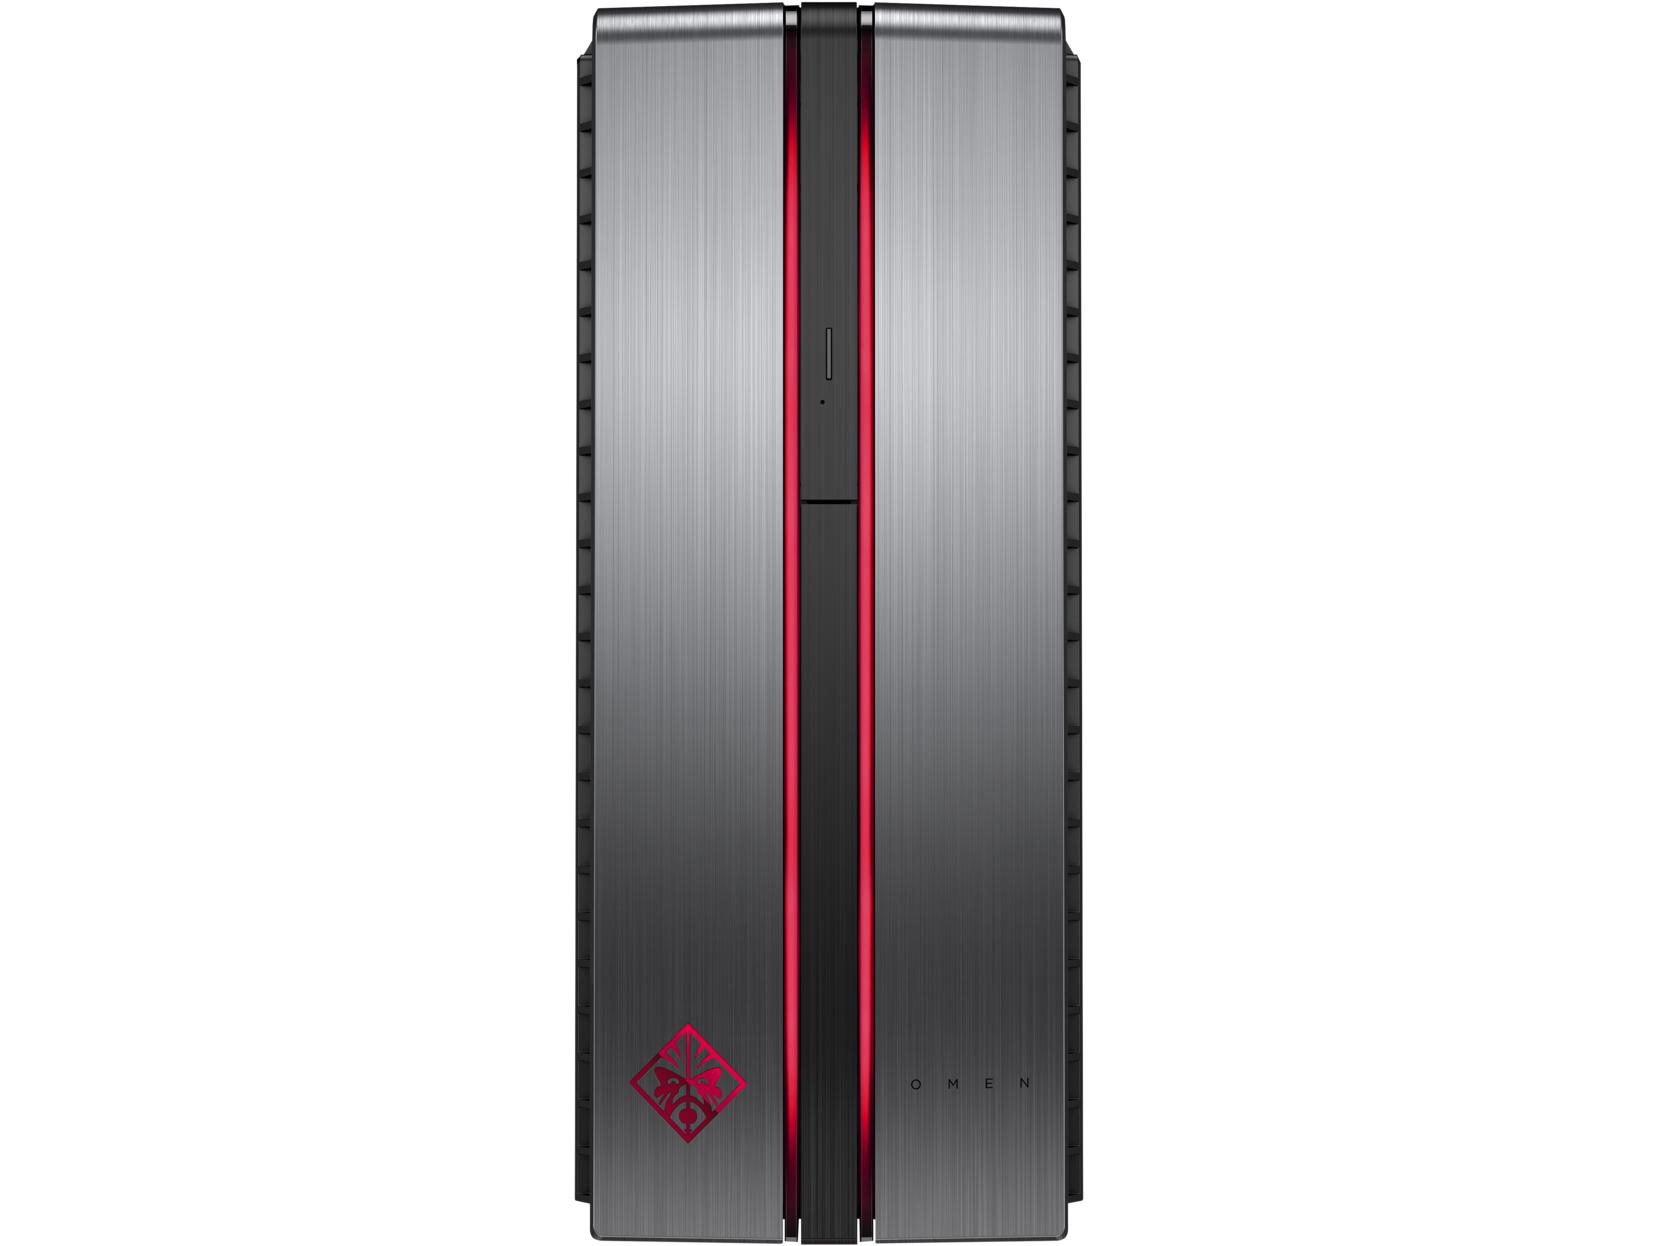 Buy hp g1 mini desktop pc desktops   Shop every store on the